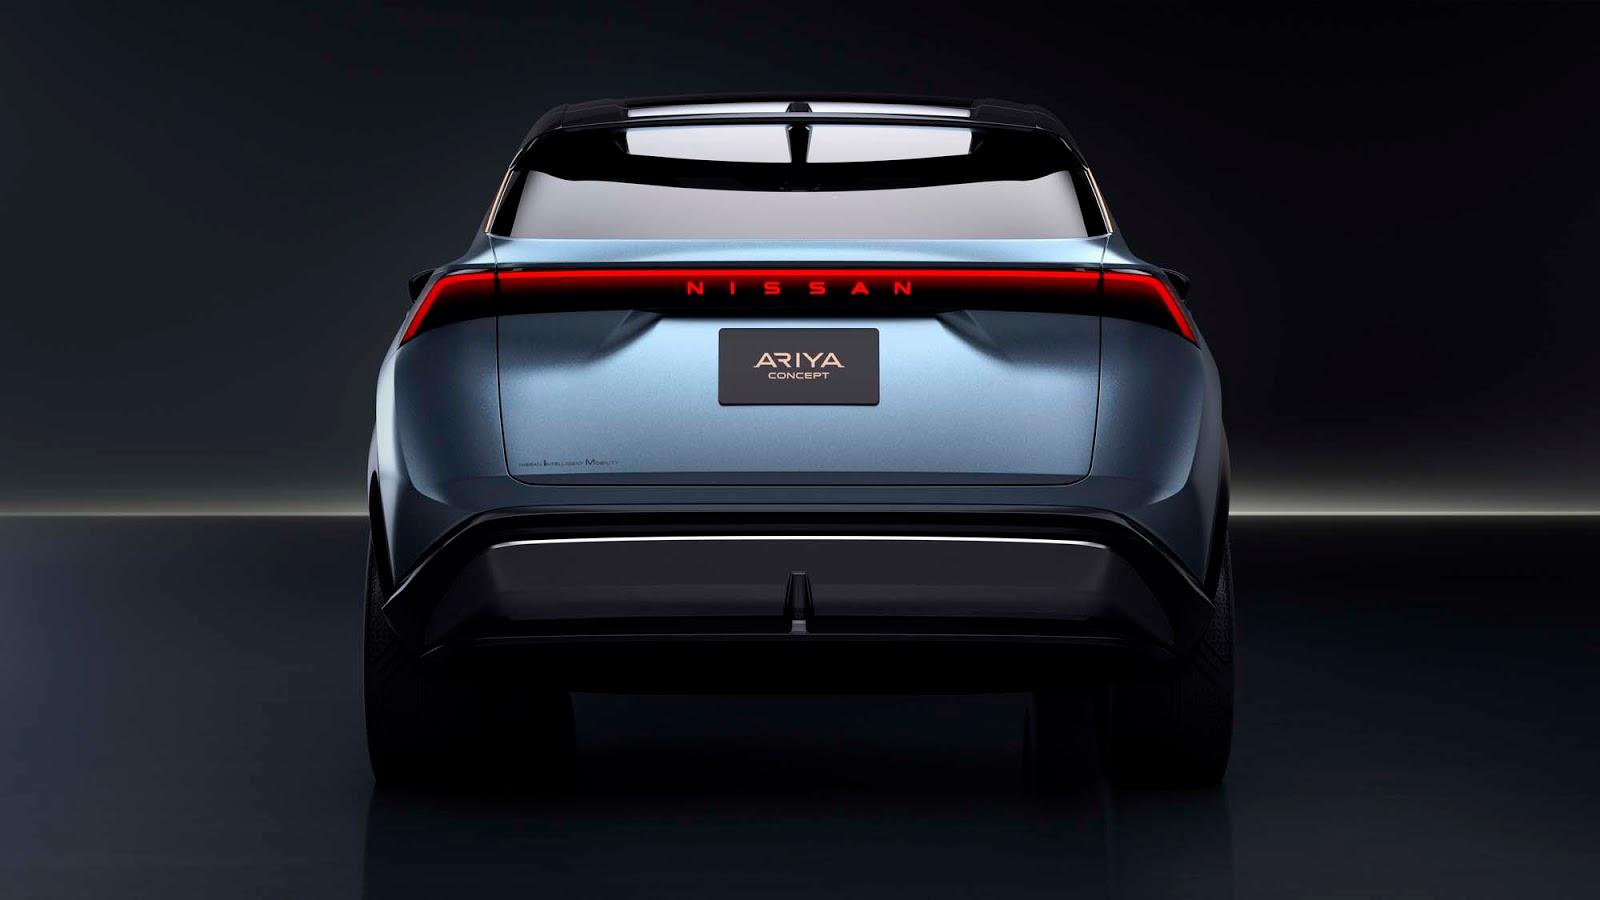 Nissan2BARIYA2BConcept 06 Με αυτό το μοντέλο η Nissan μας δείχνει το μέλλον της Electric cars, Nissan, Έκθεση, ιαπωνικά